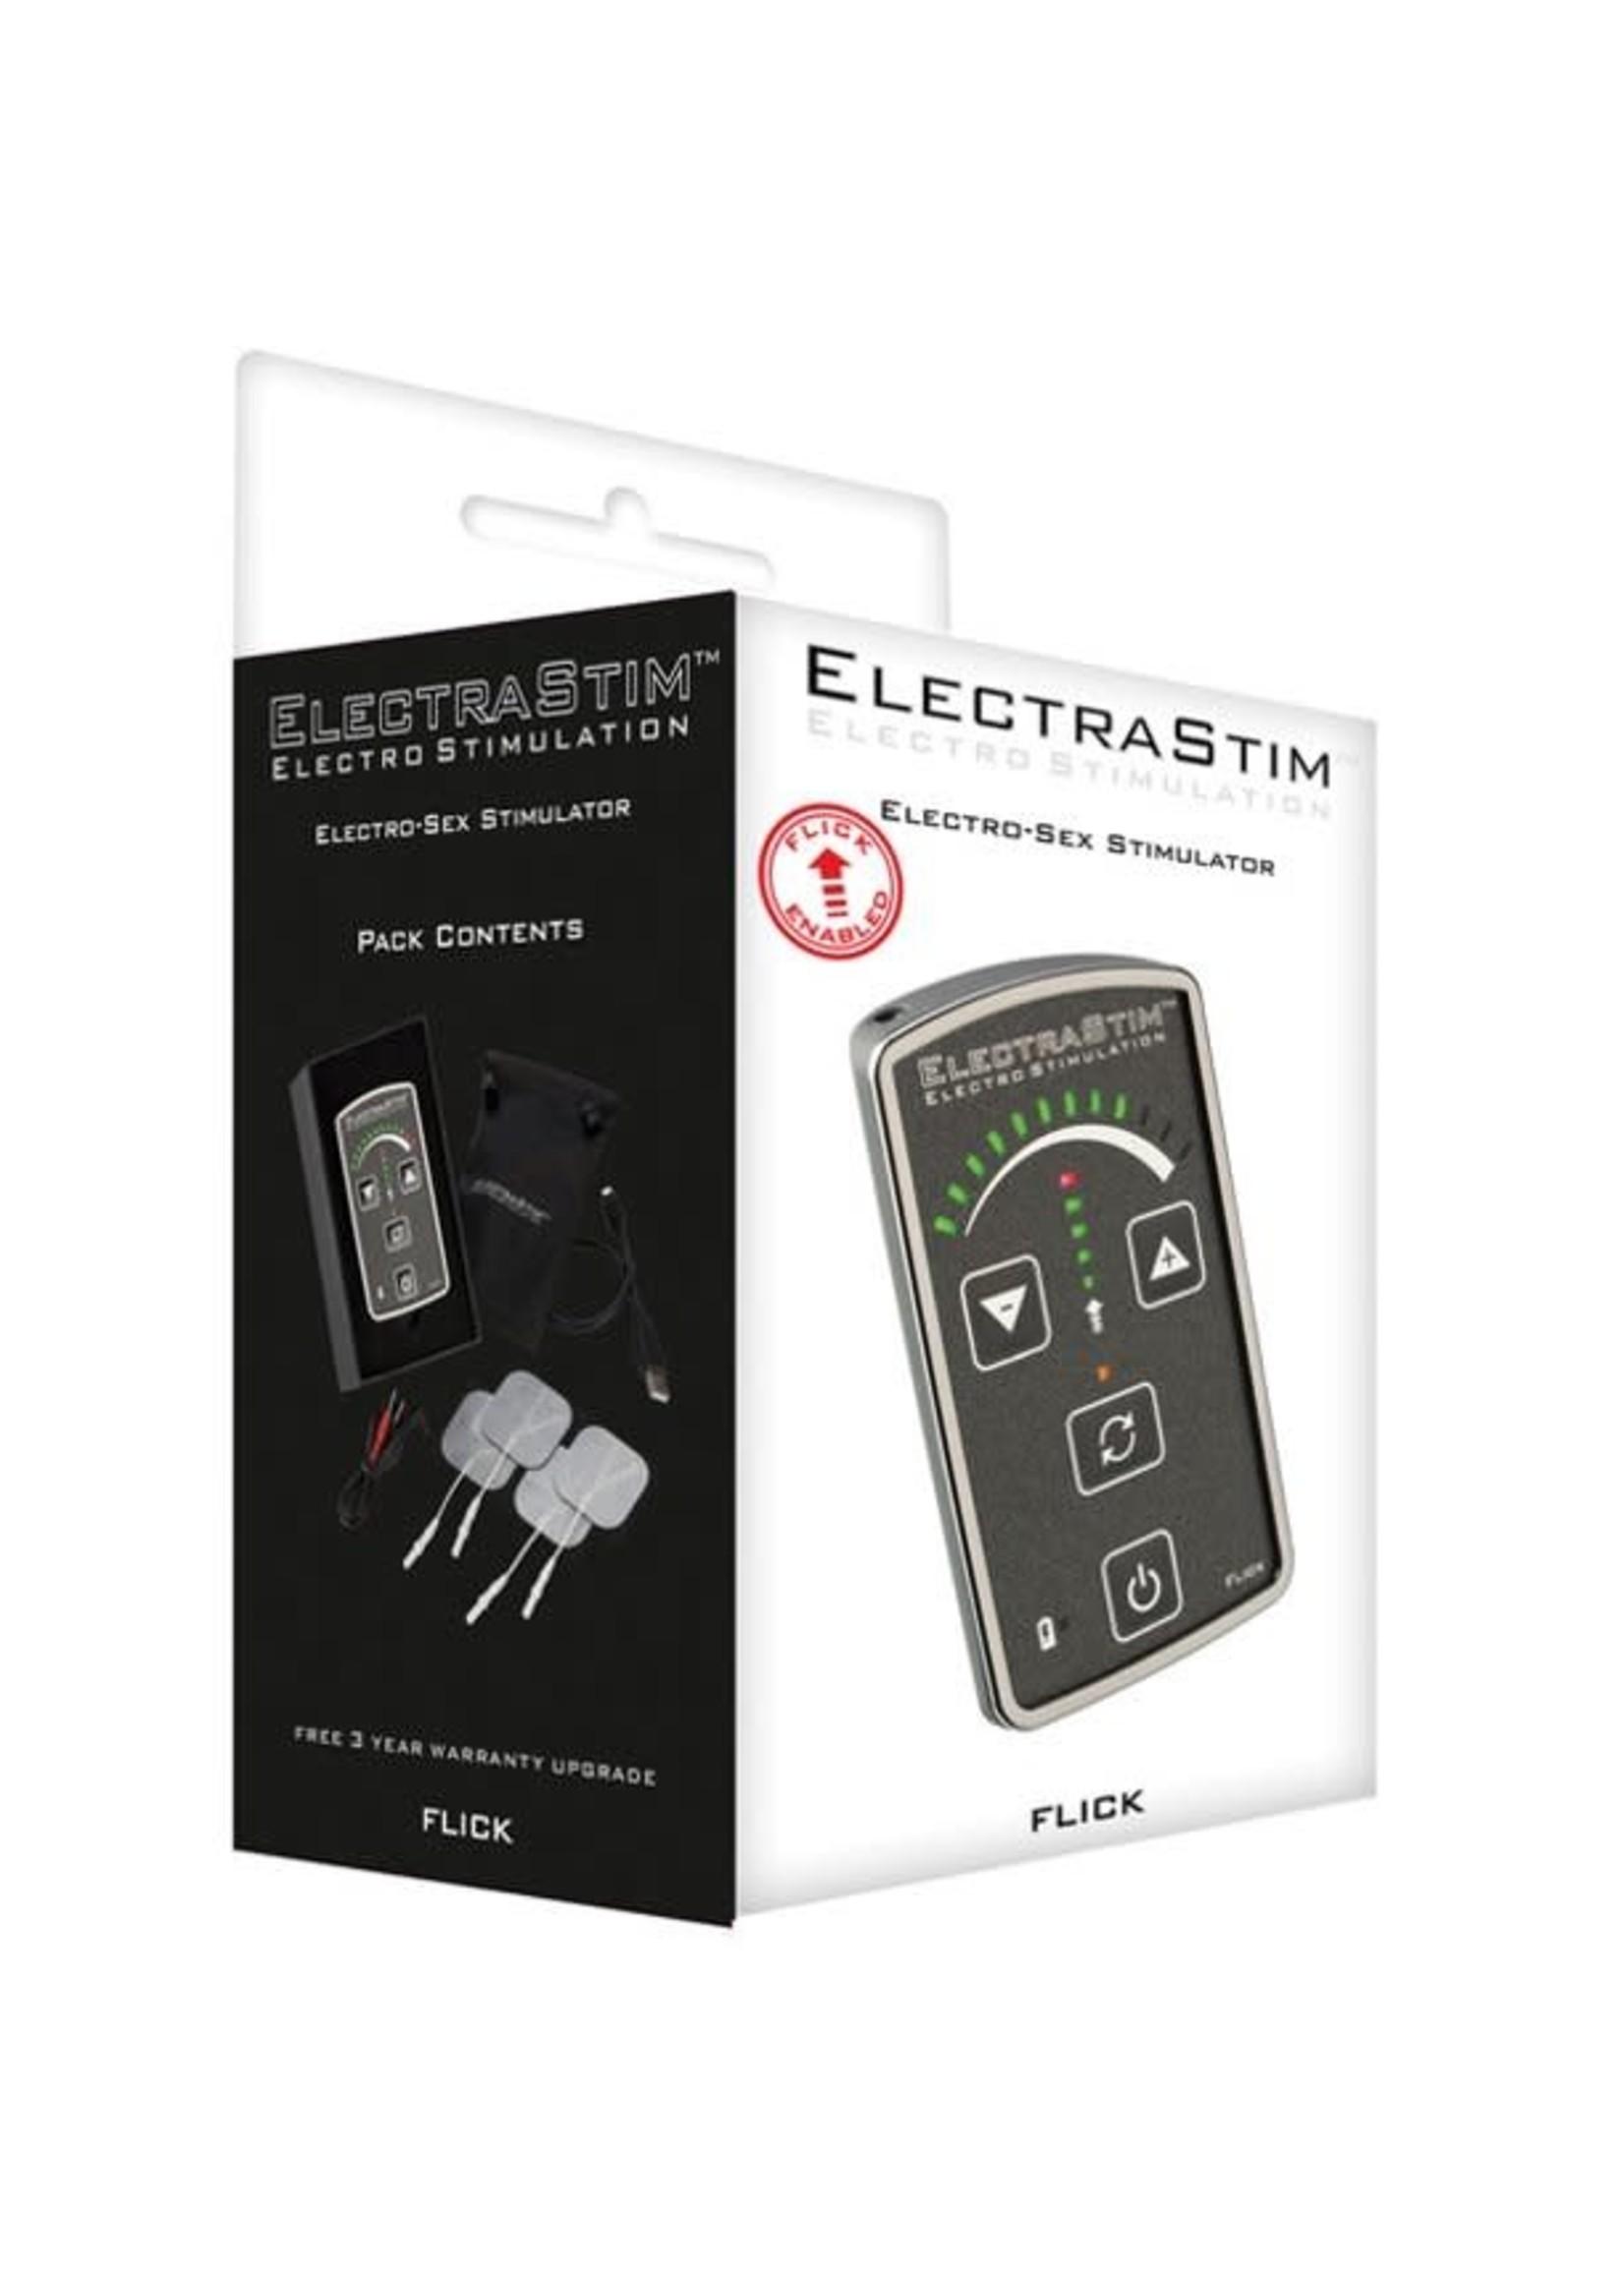 ElectraStim ElectraSim Flick Multi-Pack